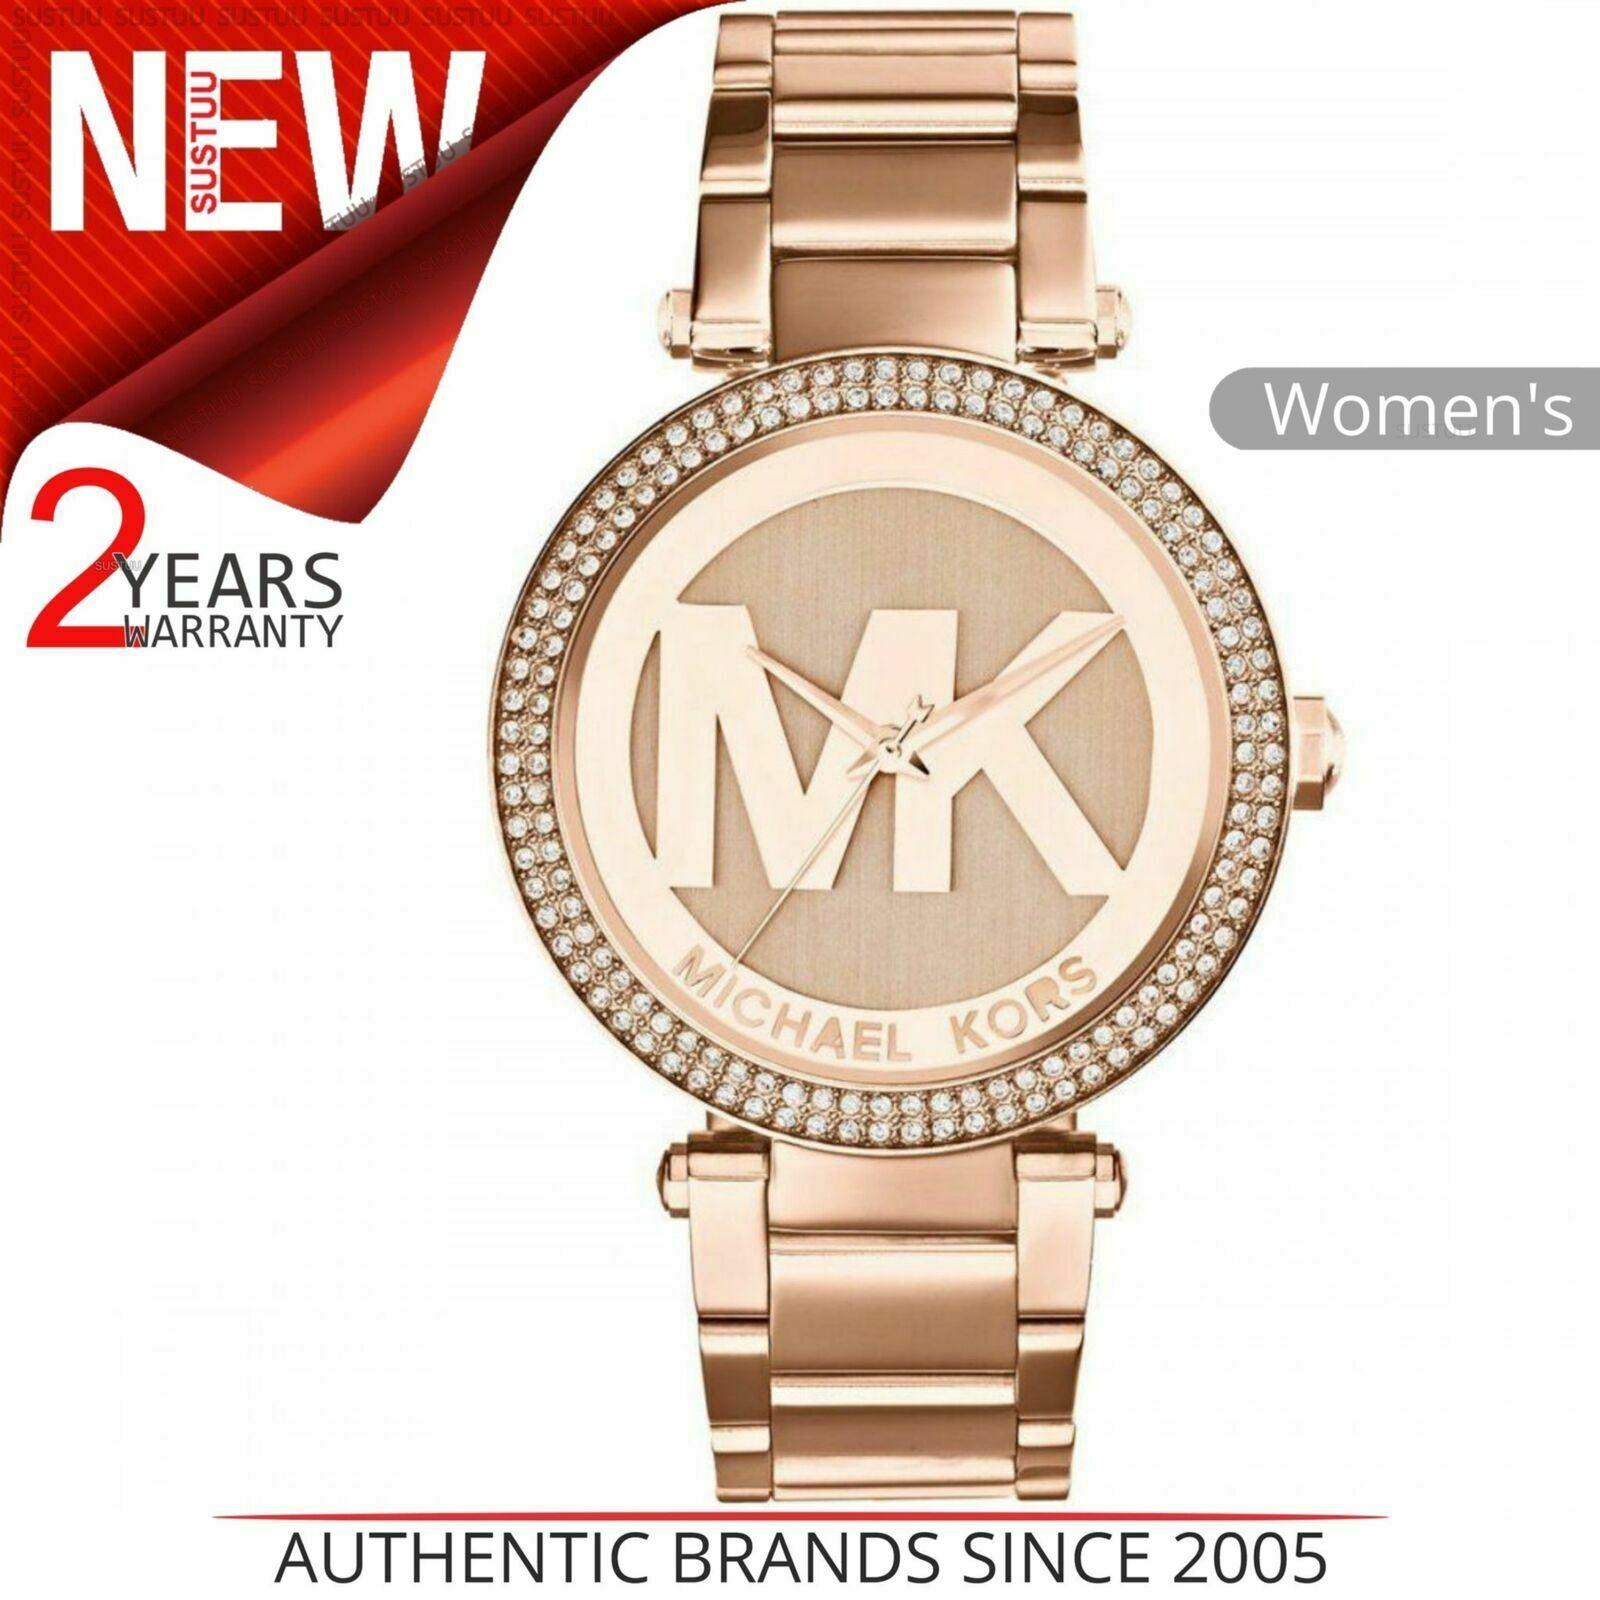 Details about Michael Kors Parker Women's Watch¦Rose Gold MK Logo Dial¦Bracelet Band¦MK5865